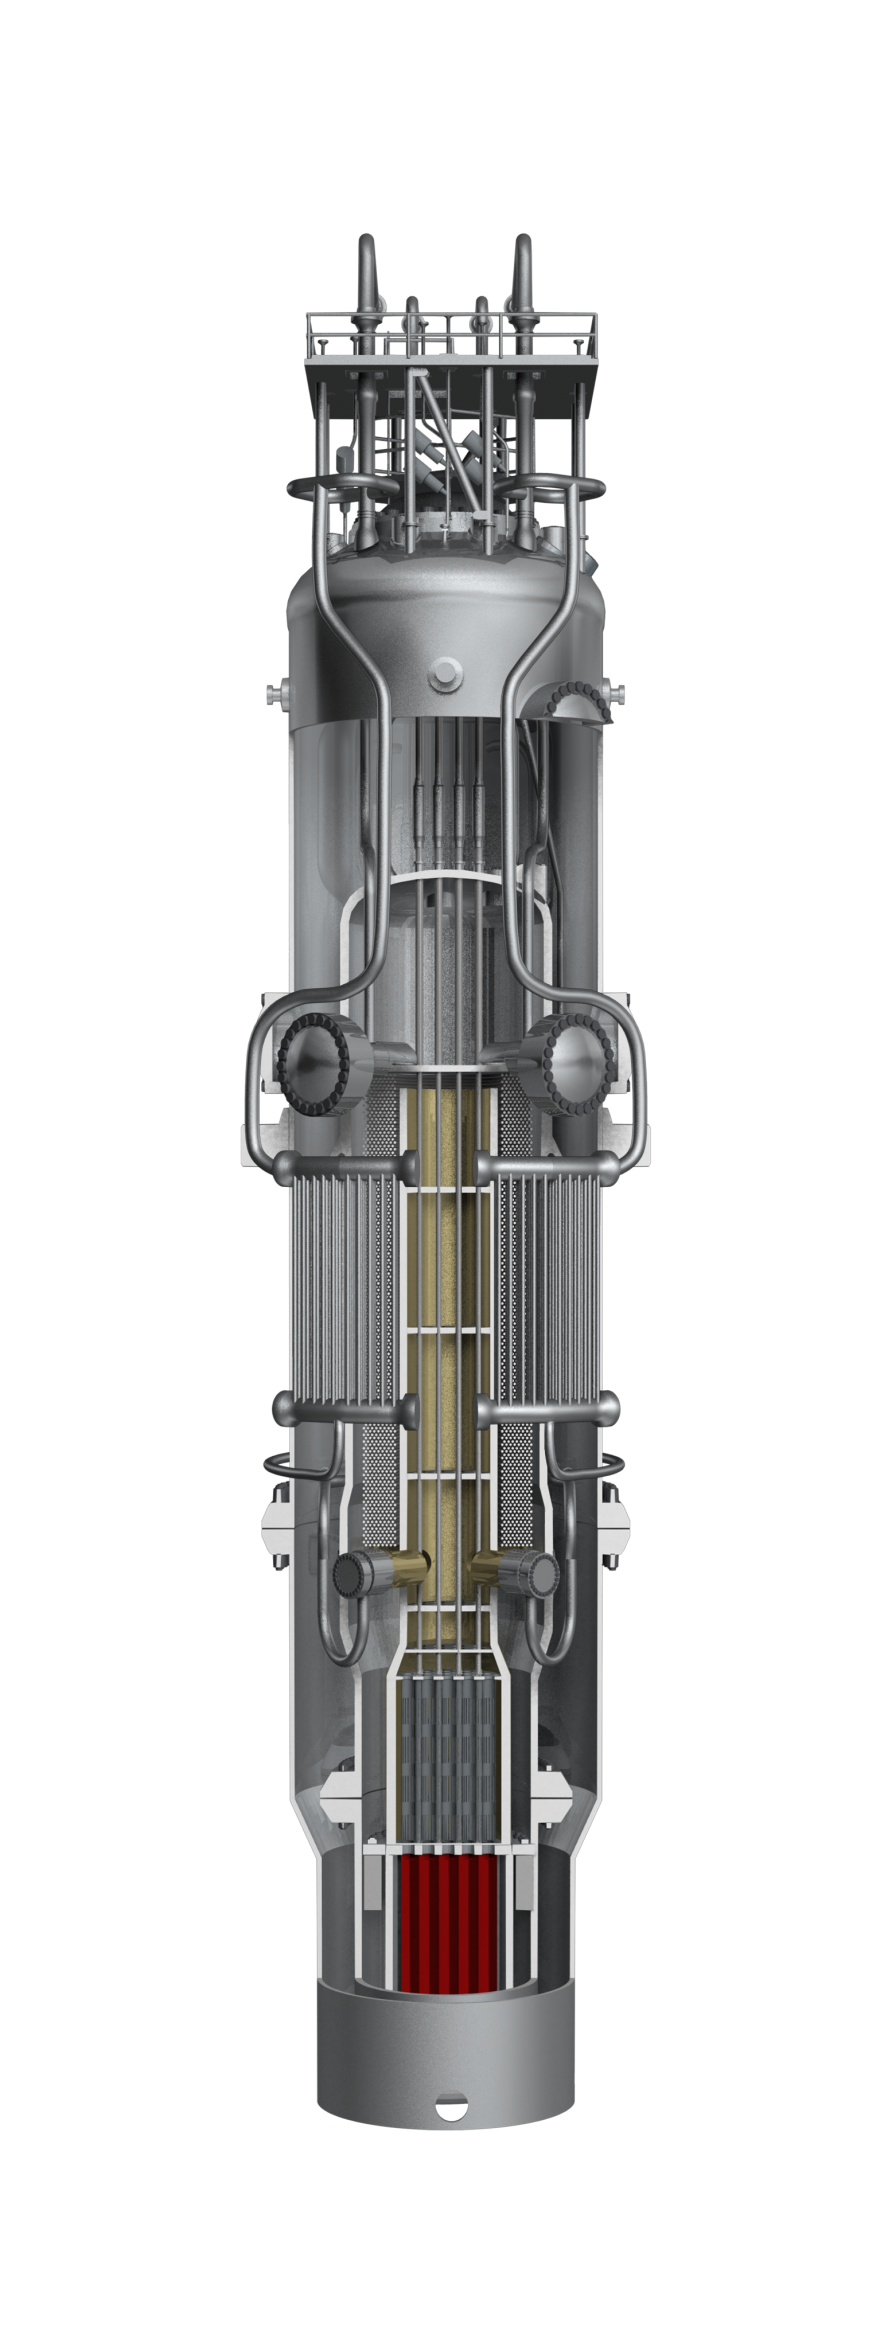 nuscale power module drawing